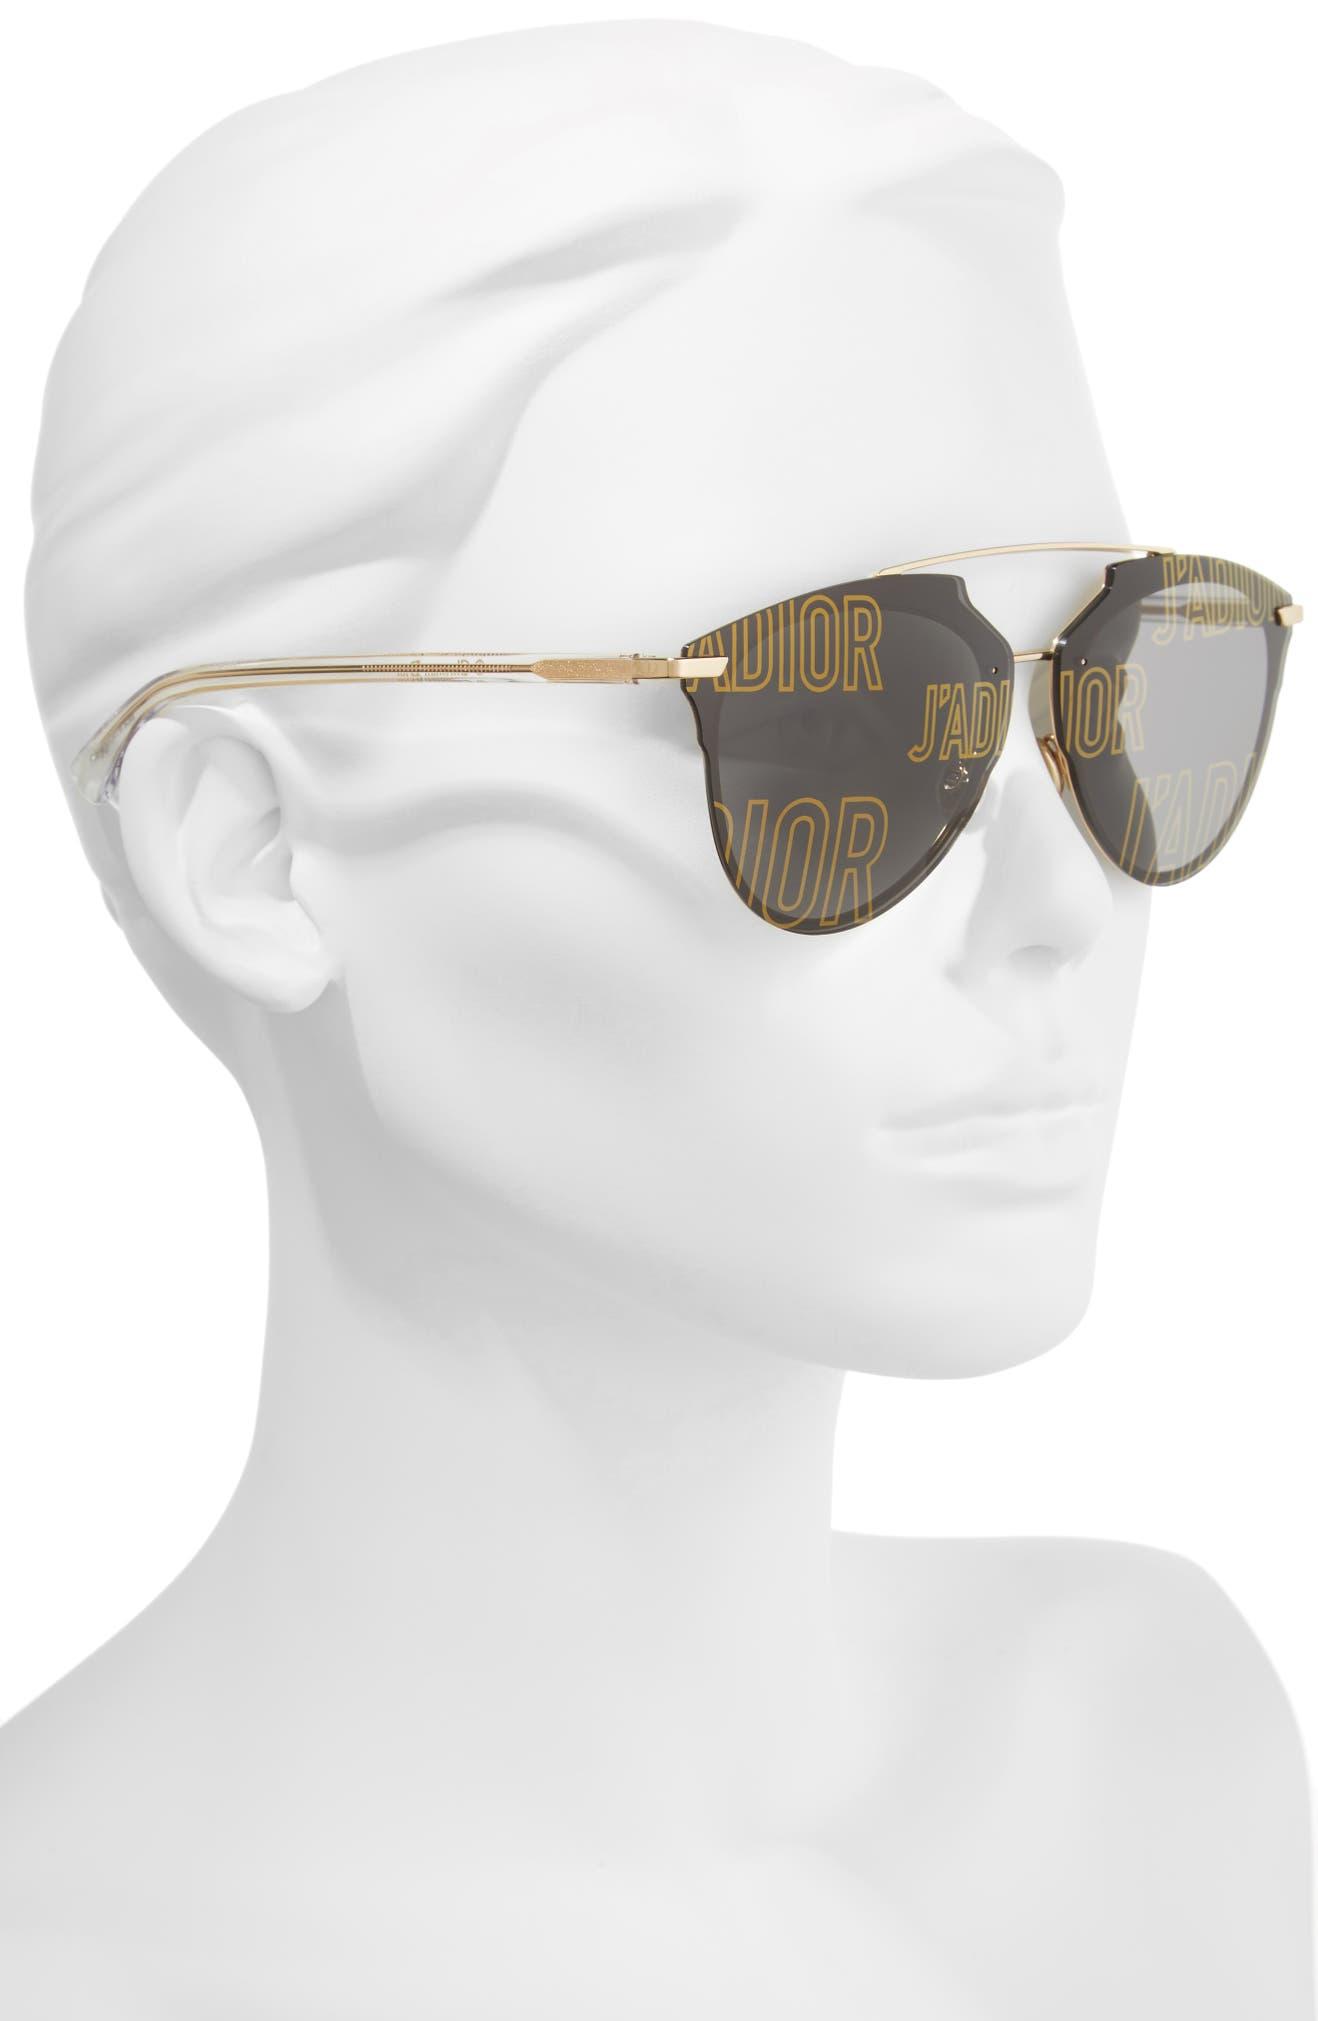 8bdcaac11e43 Dior Reflected Prism 63mm Oversize Mirrored Brow Bar Sunglasses ...